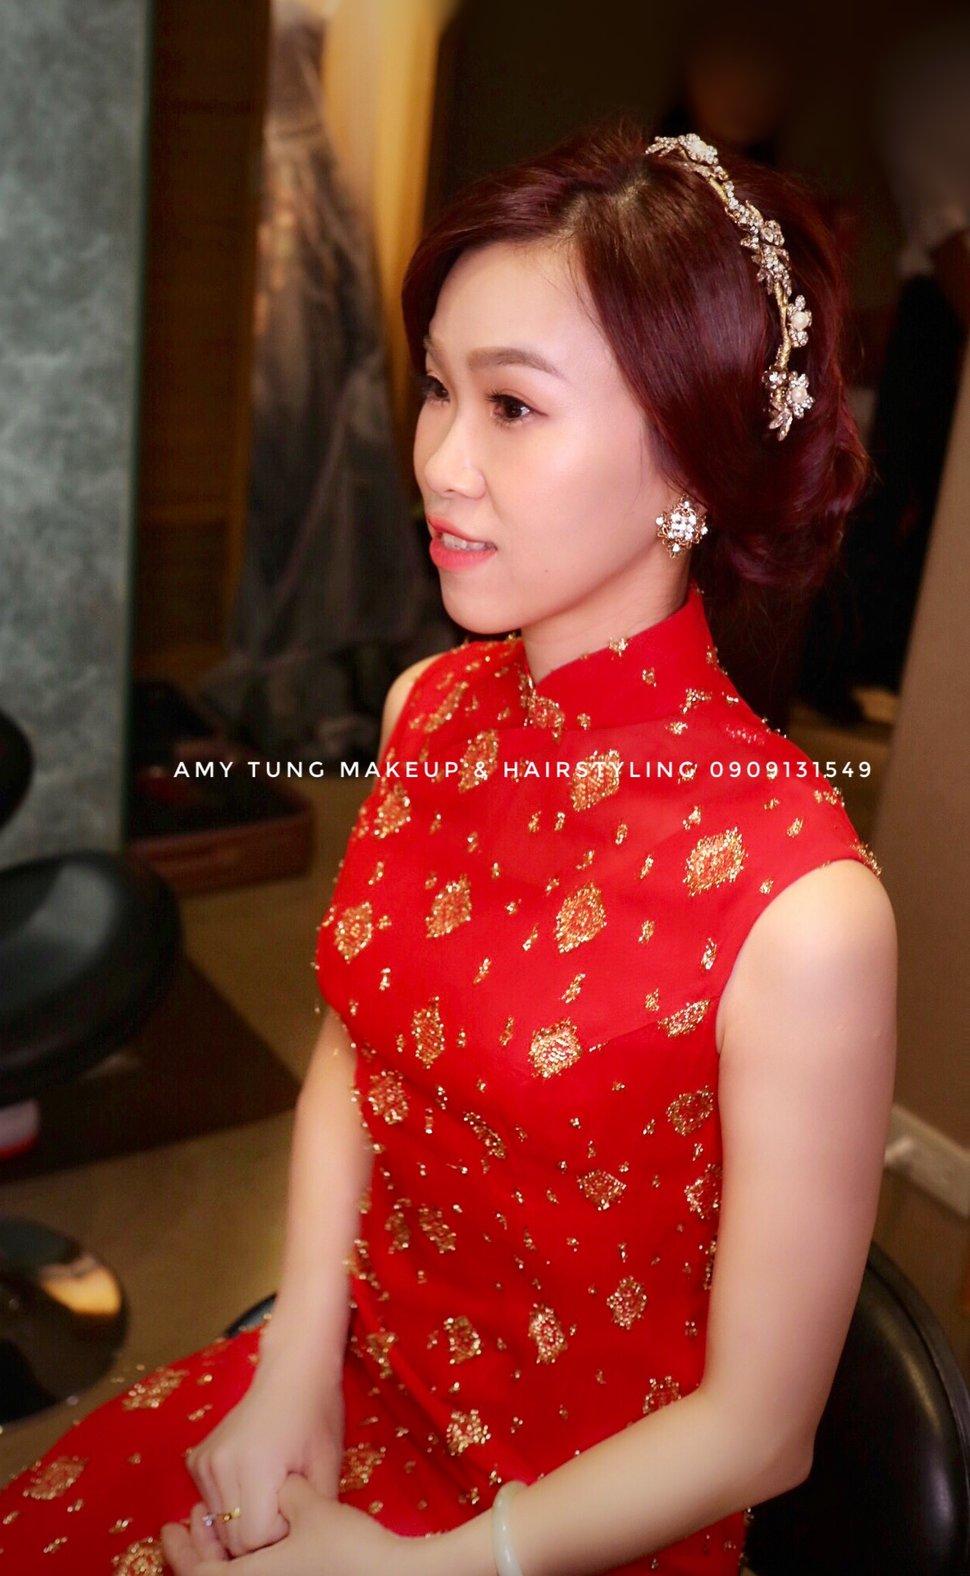 E800811A-E332-45A7-8E12-F32B36A50F46 - Amy Tung Makeup《結婚吧》